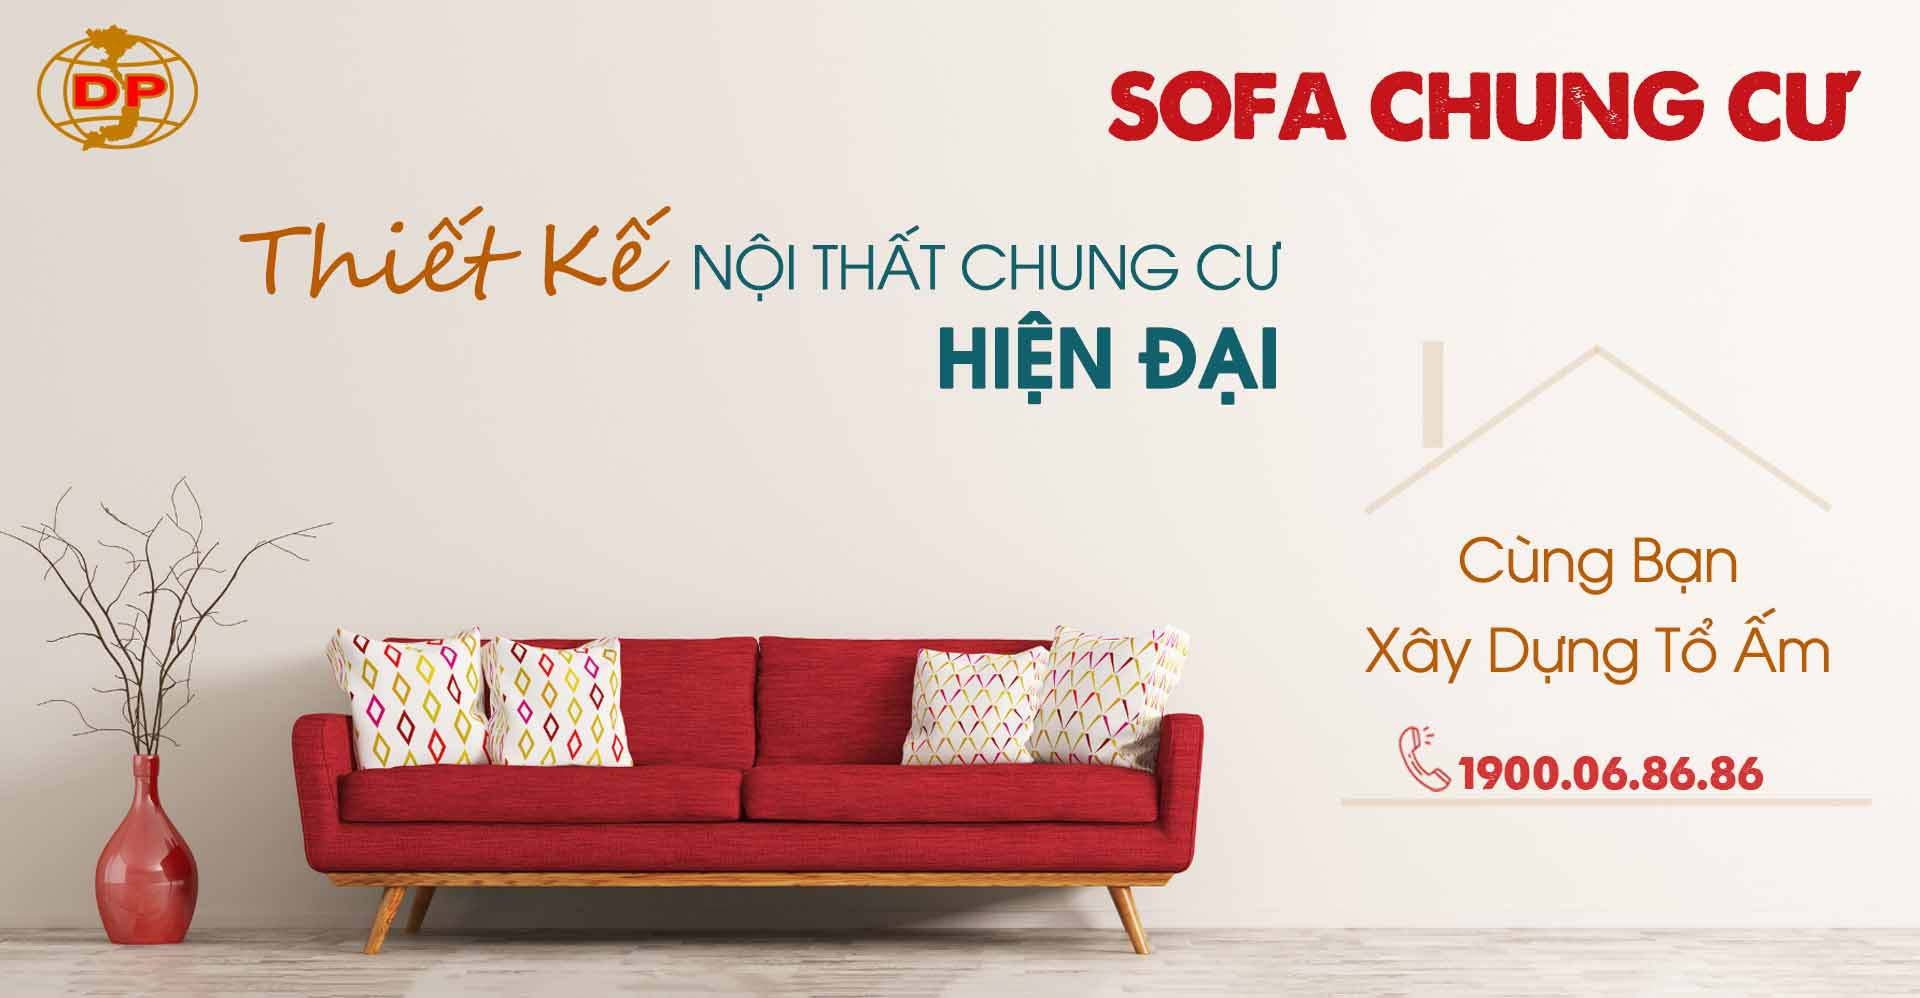 Sofa Chung Cư